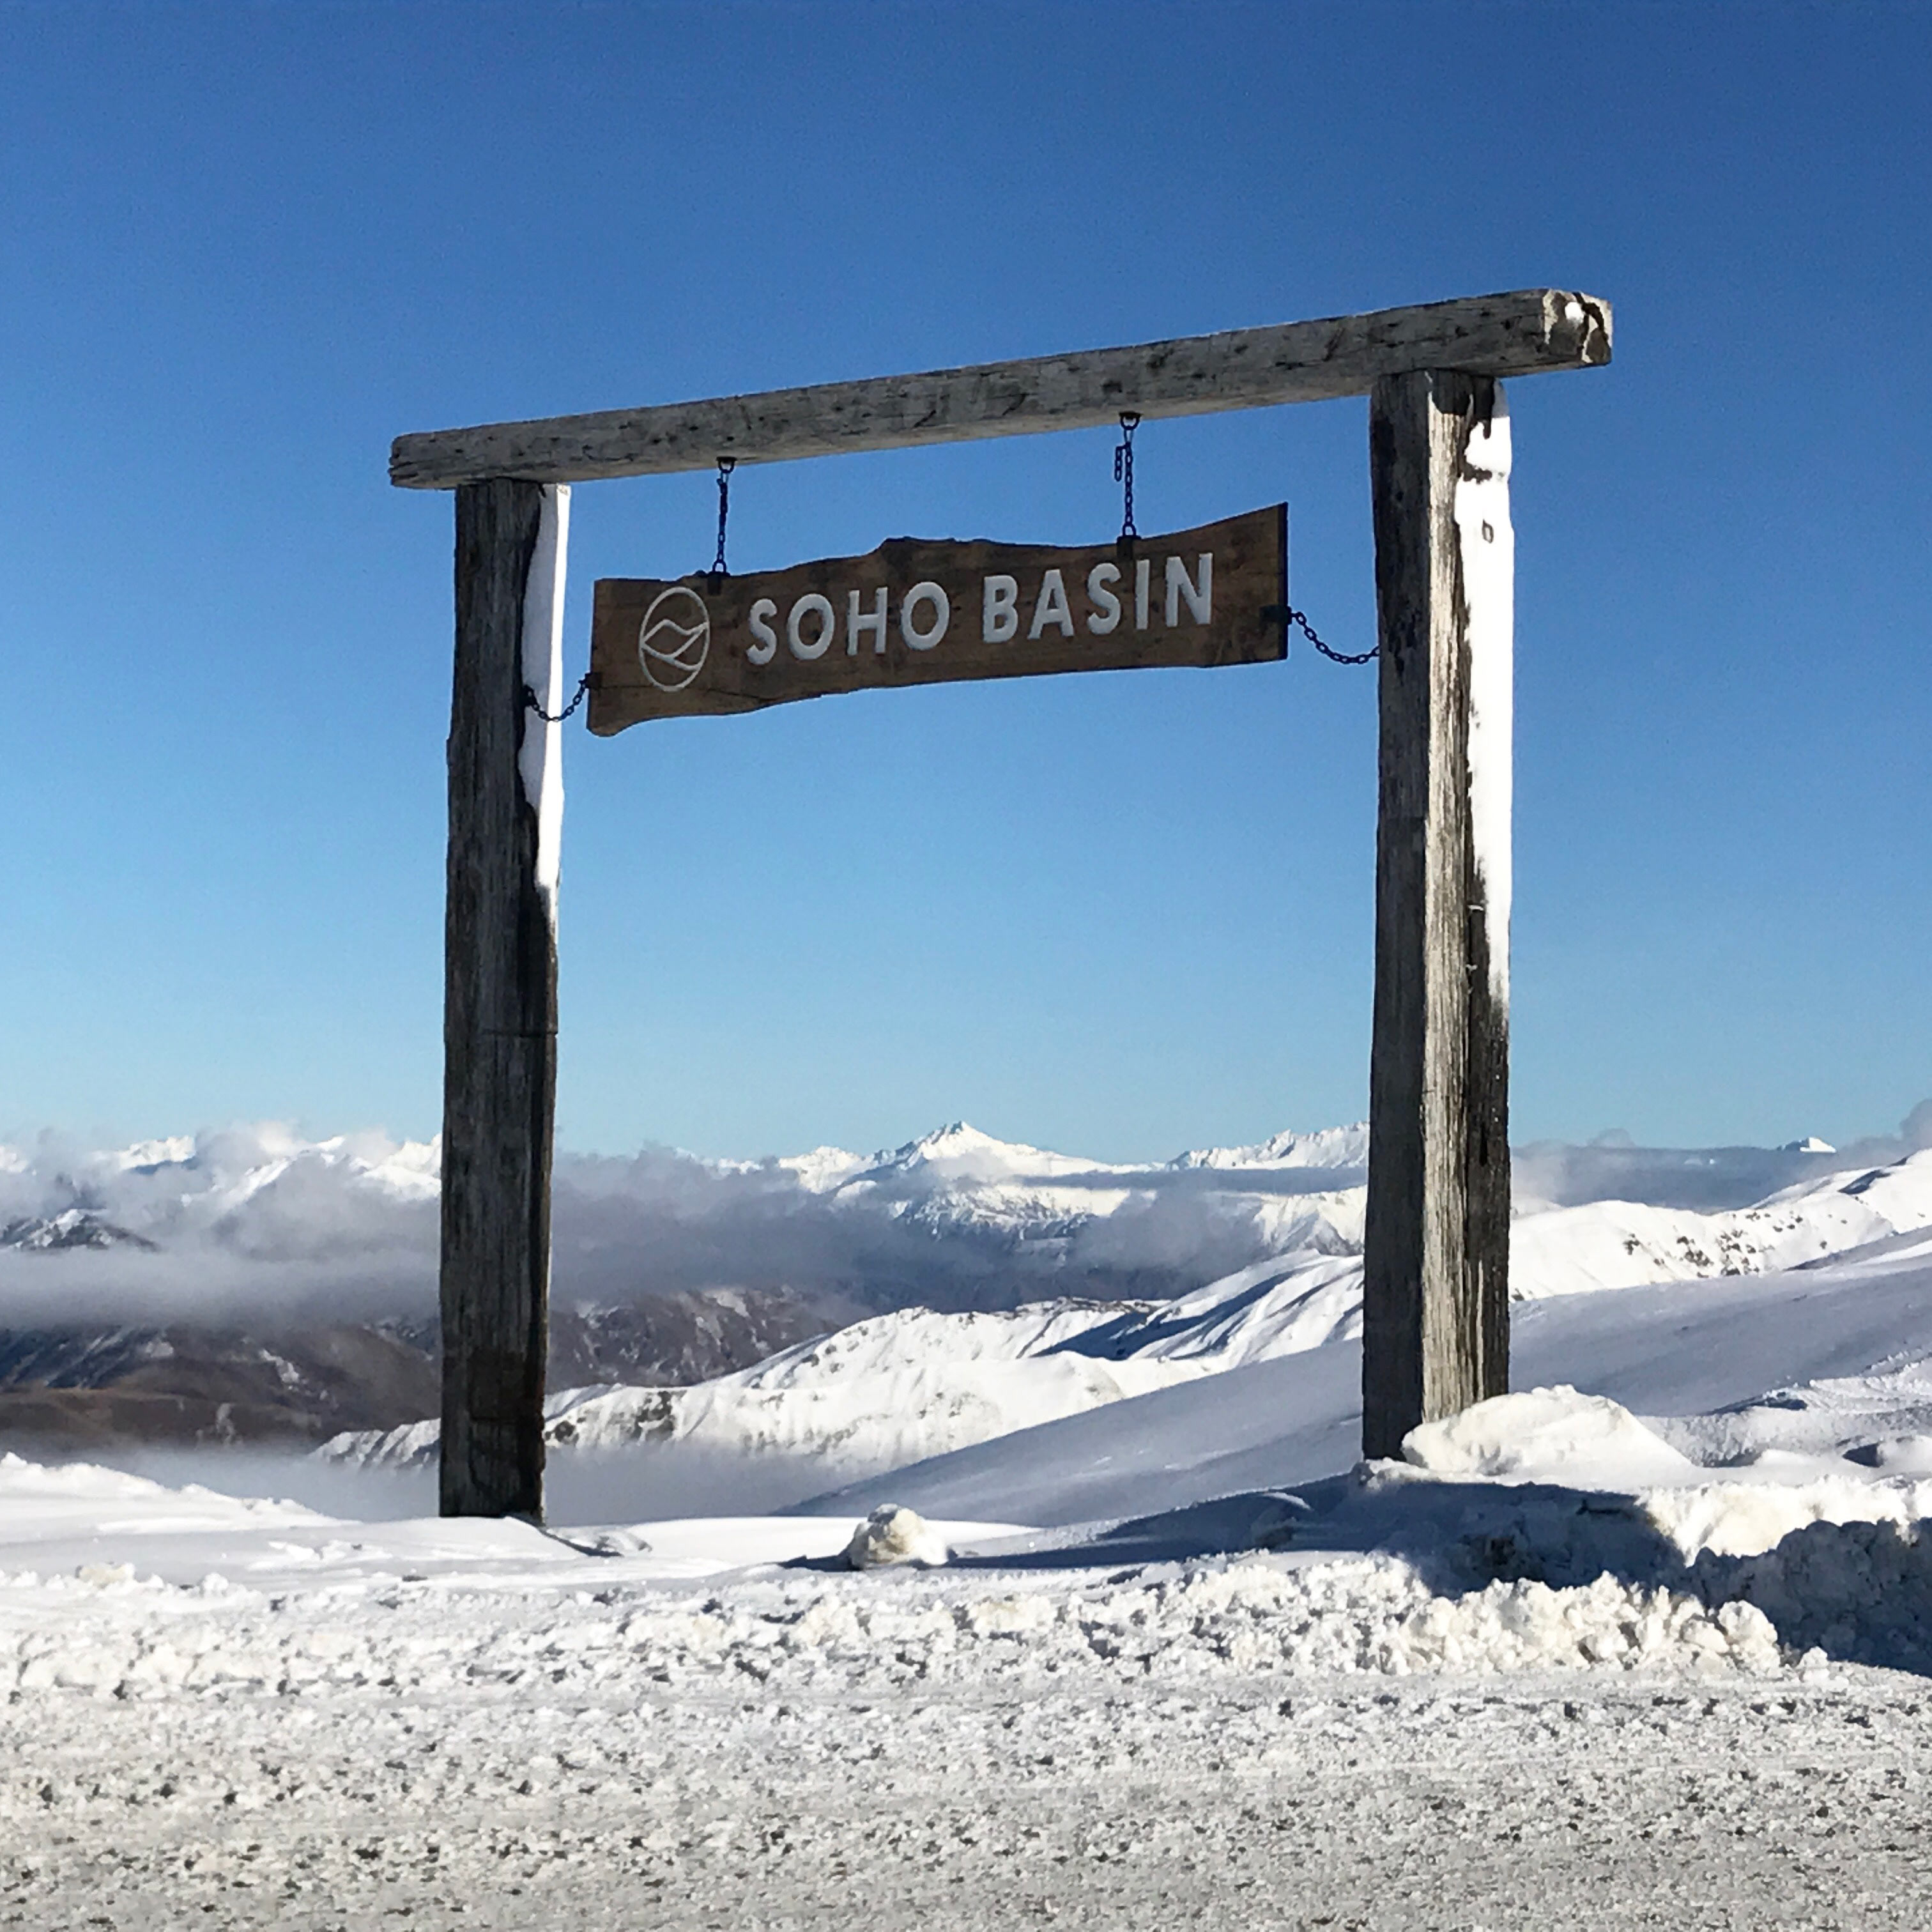 Cardrona Soho Basin Ski Slope